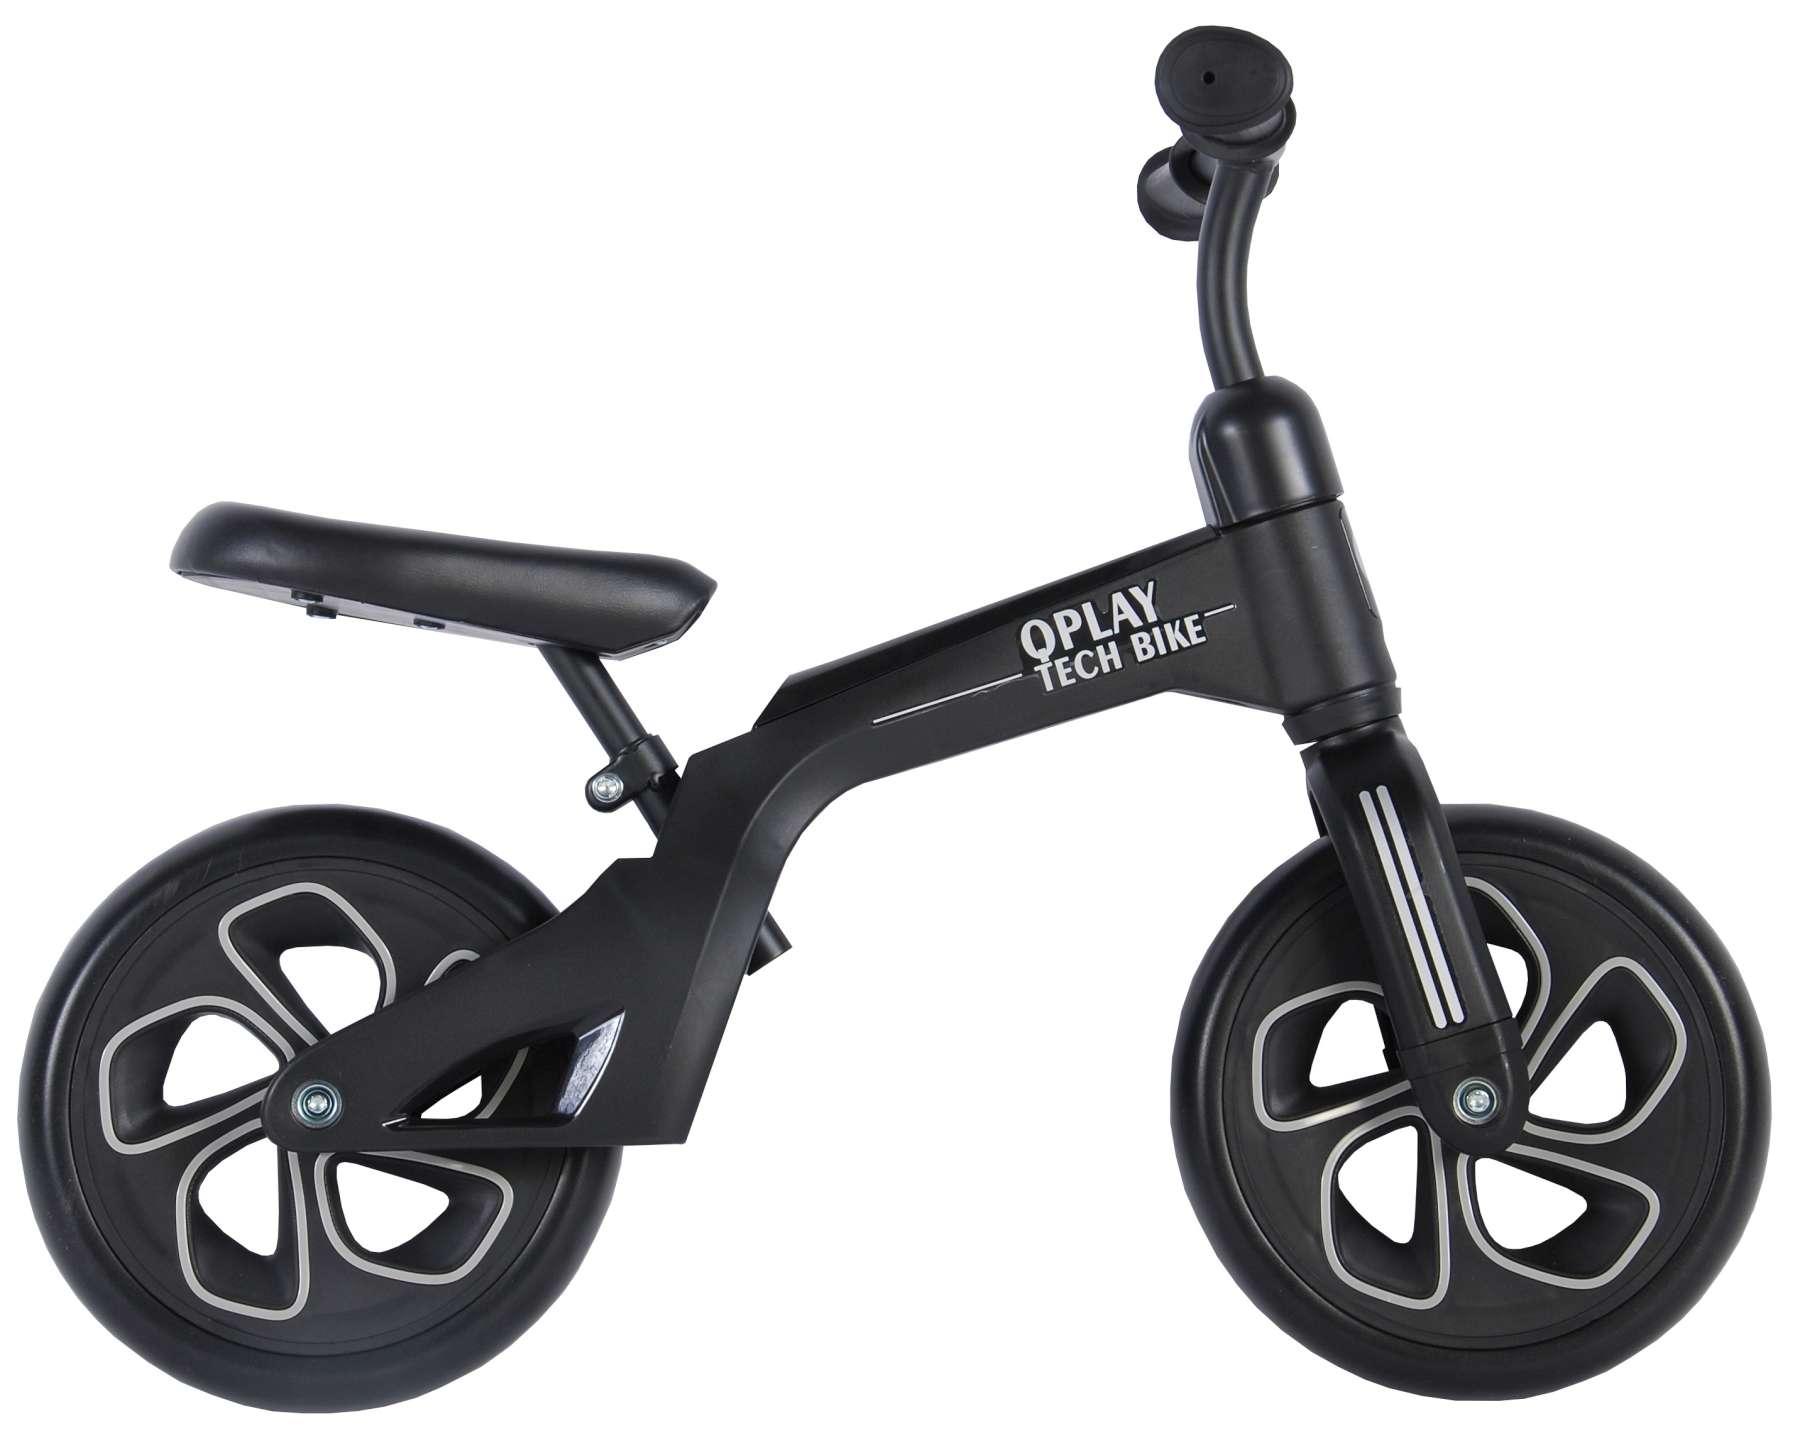 Bicicleta evolutiva QPlay Balance 10 pulgadas Negra